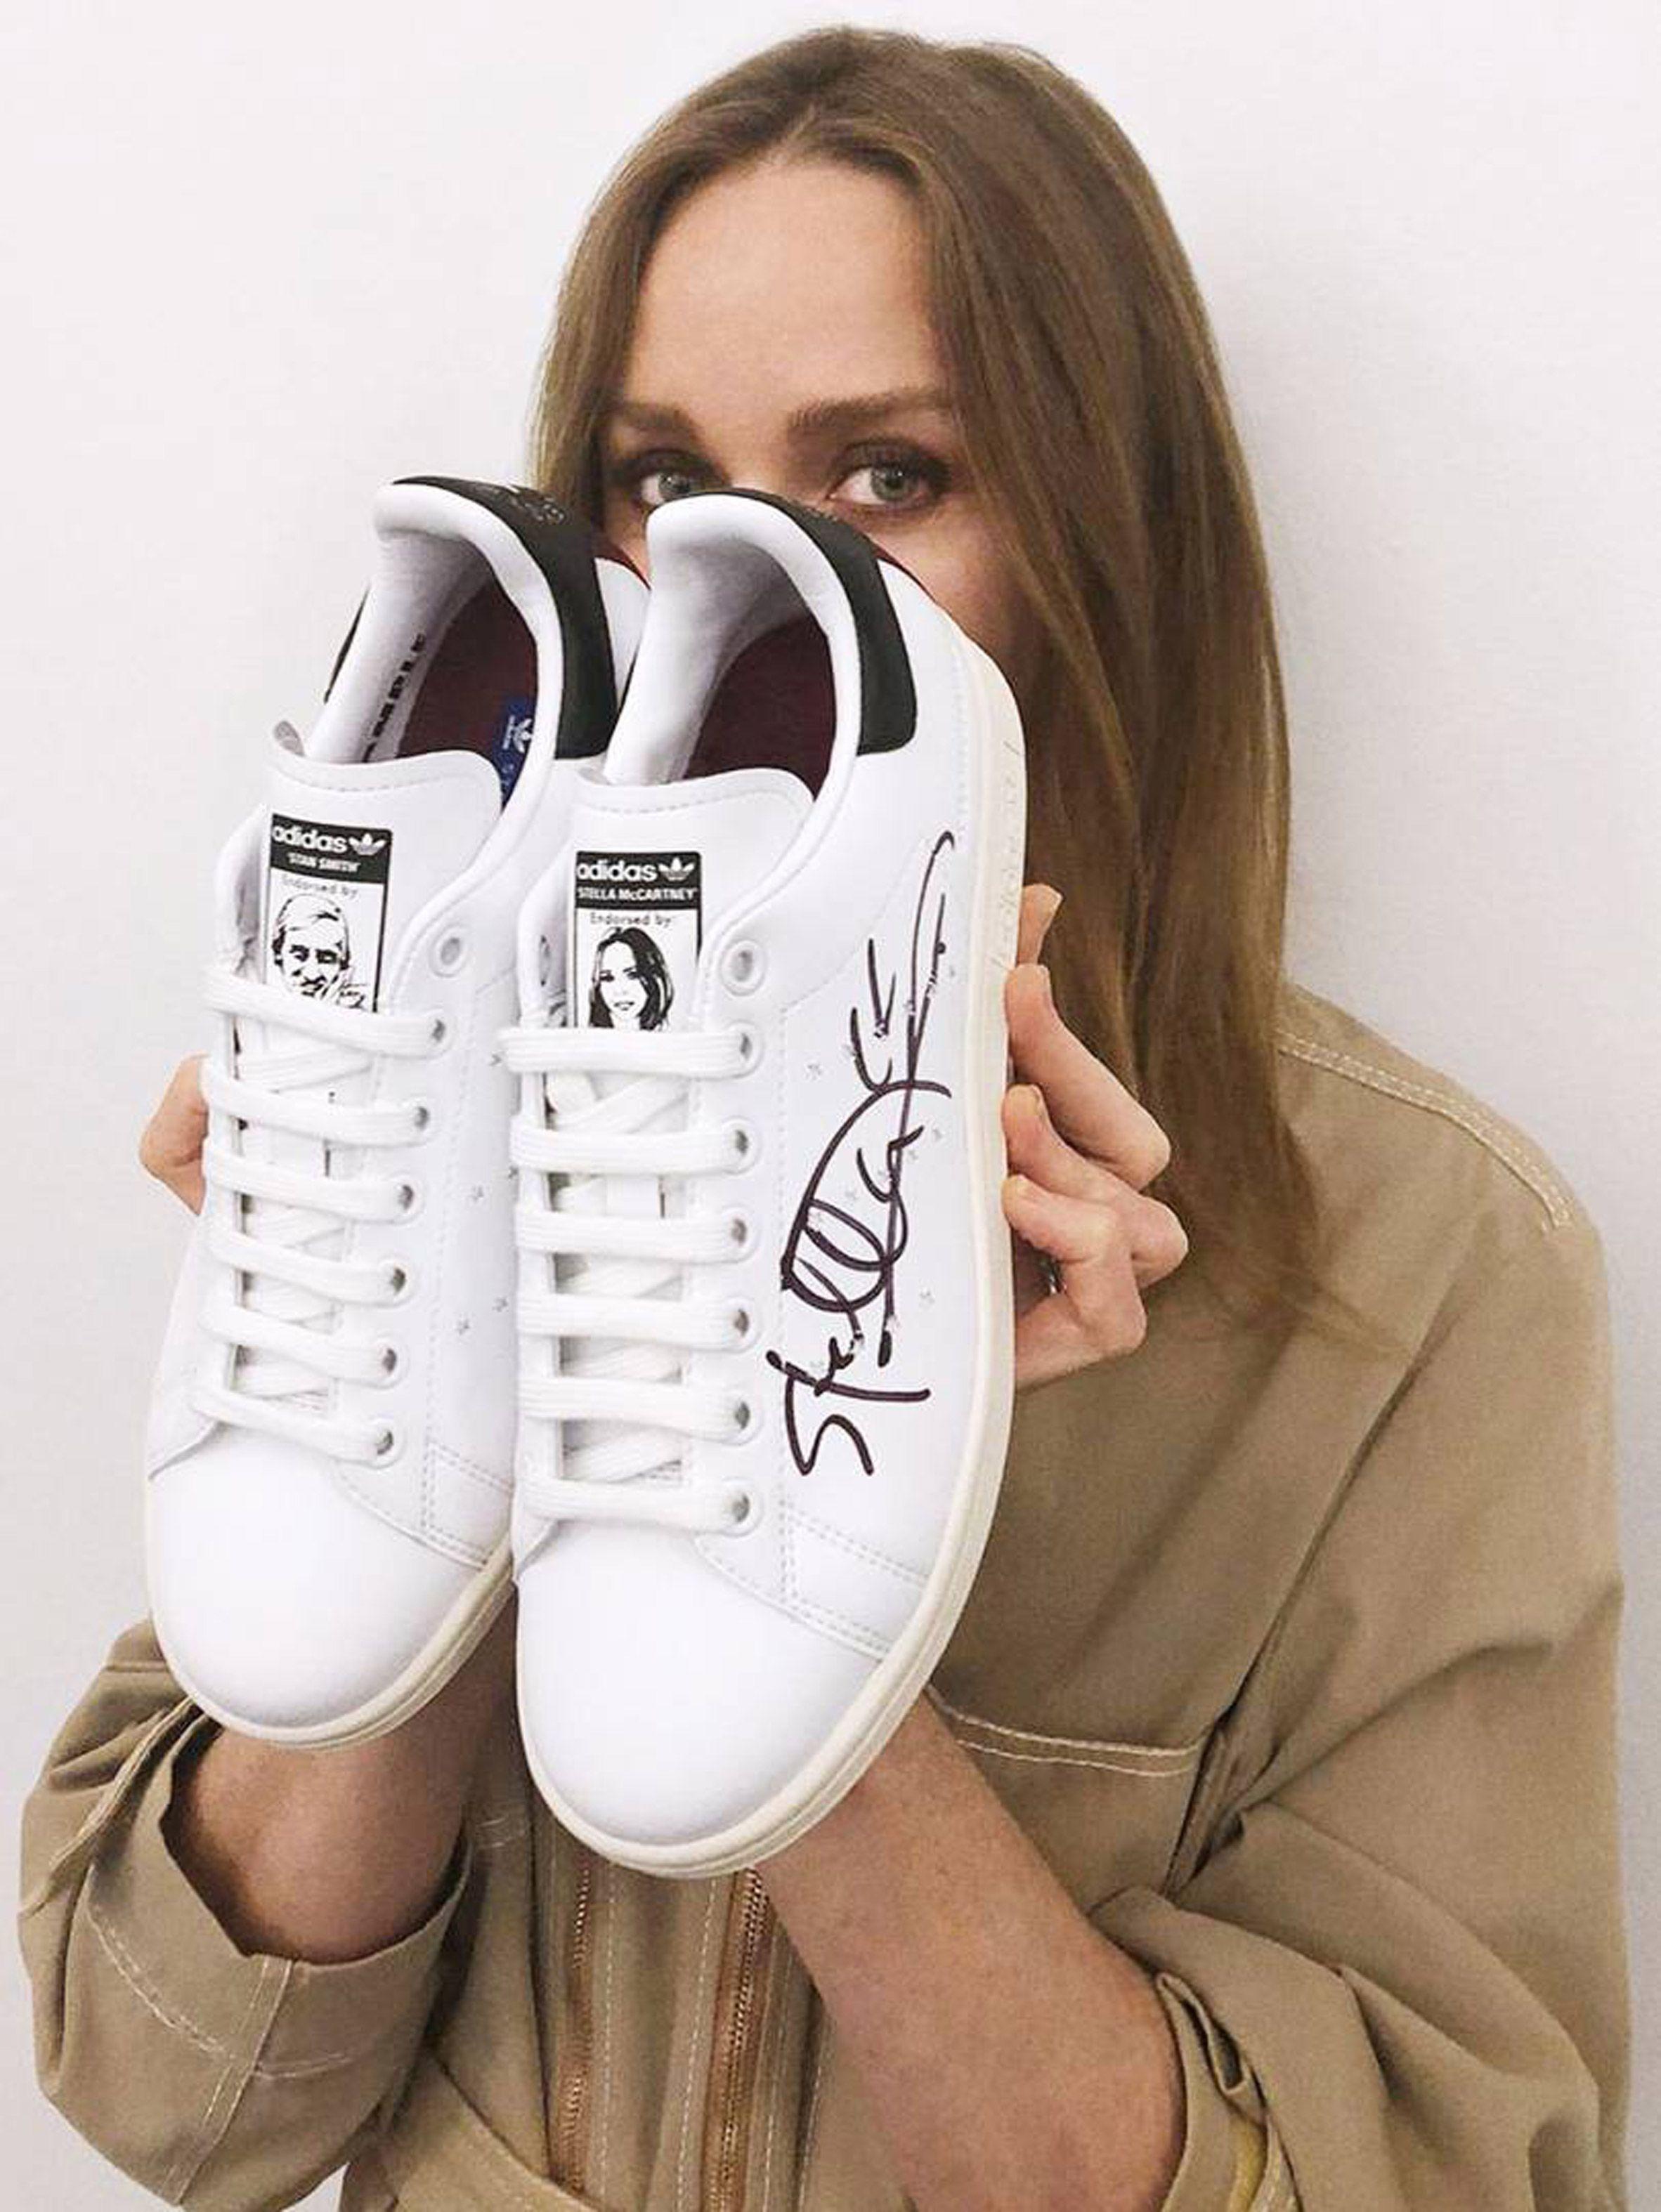 edfbd4c5551039 Stella McCartney and Adidas launch vegan Stan Smiths